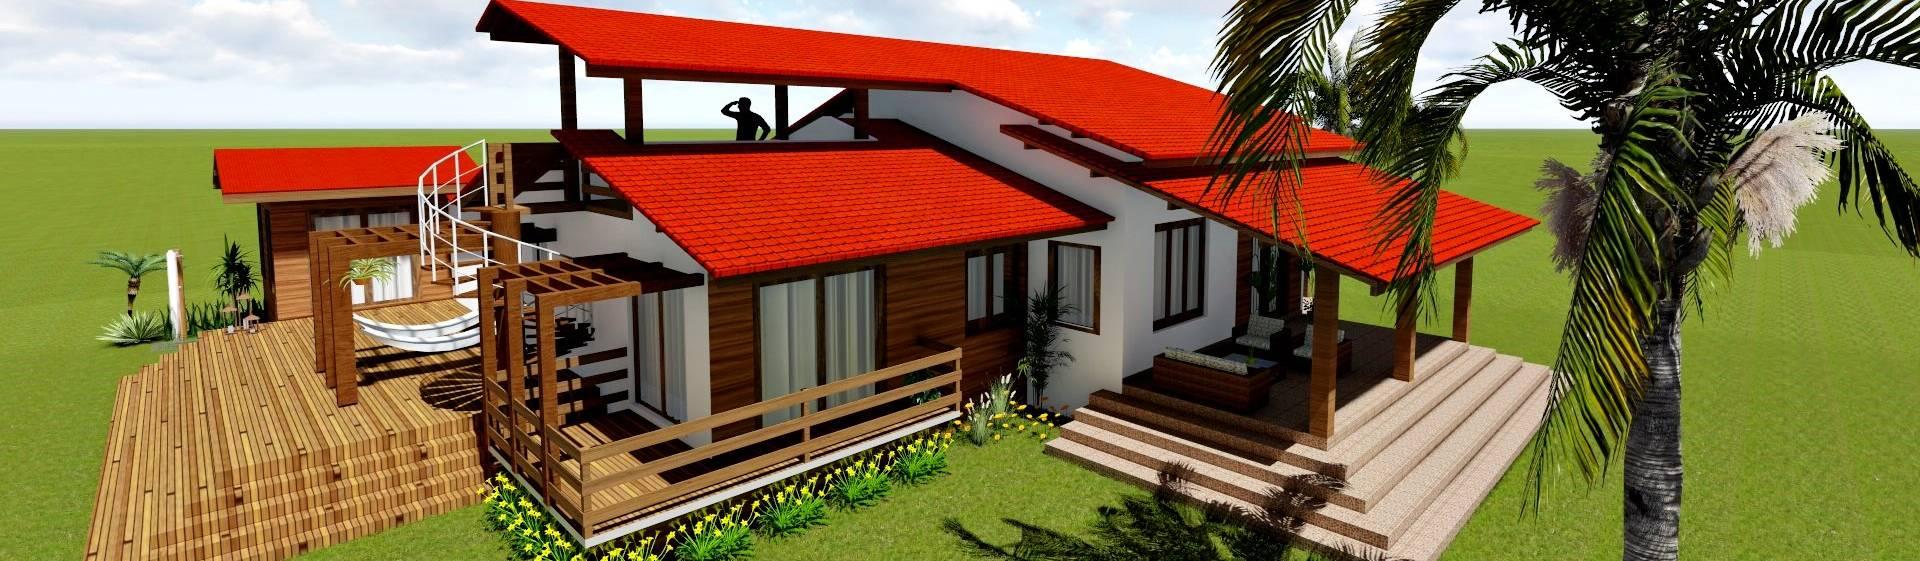 Aidê Arquitetura